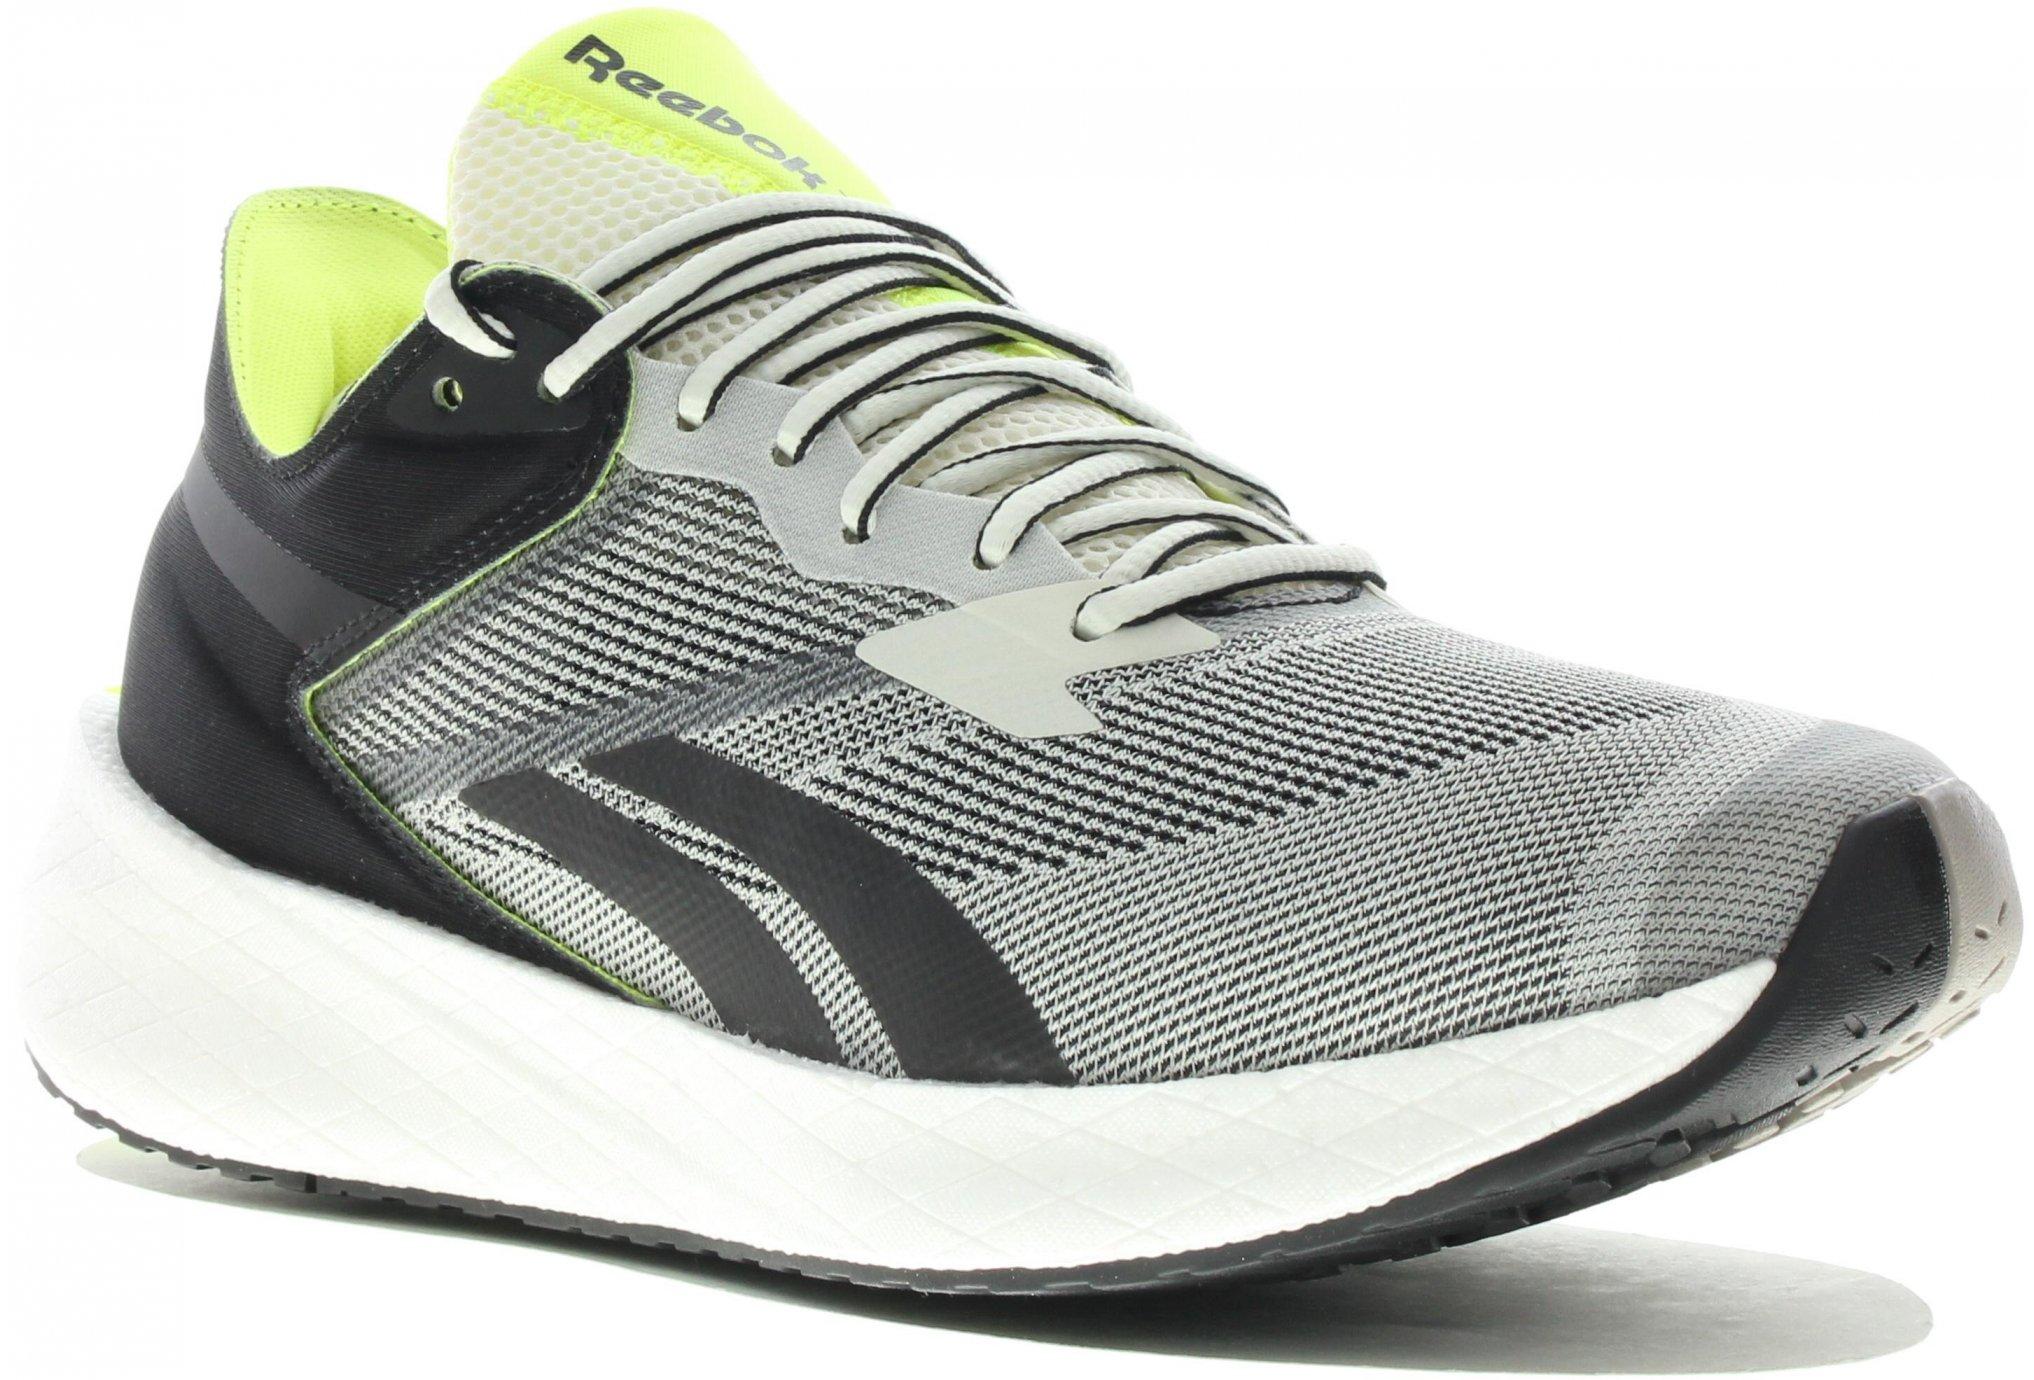 Reebok Floatride Energy Symmetros M Chaussures homme